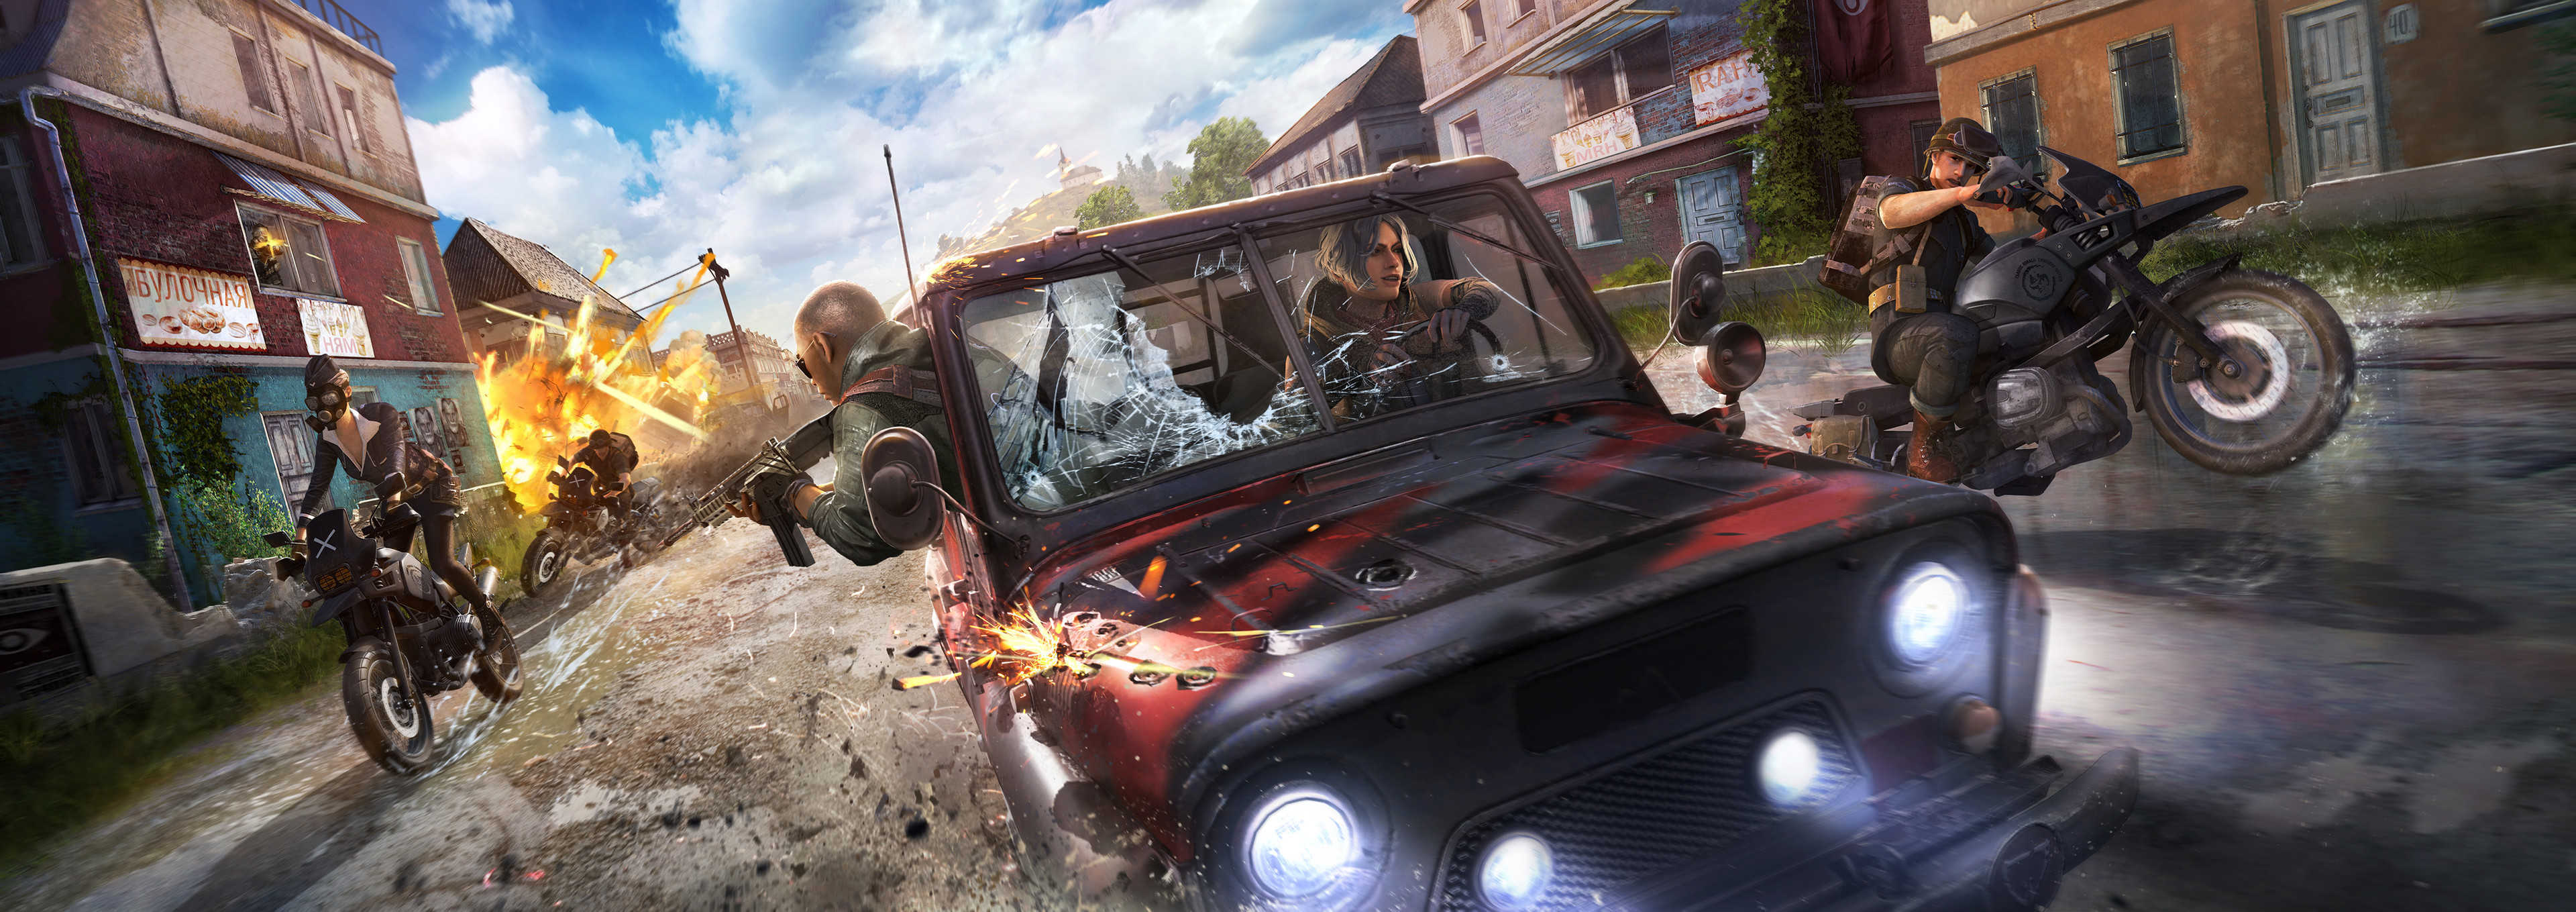 Video Game Playerunknown's Battlegrounds